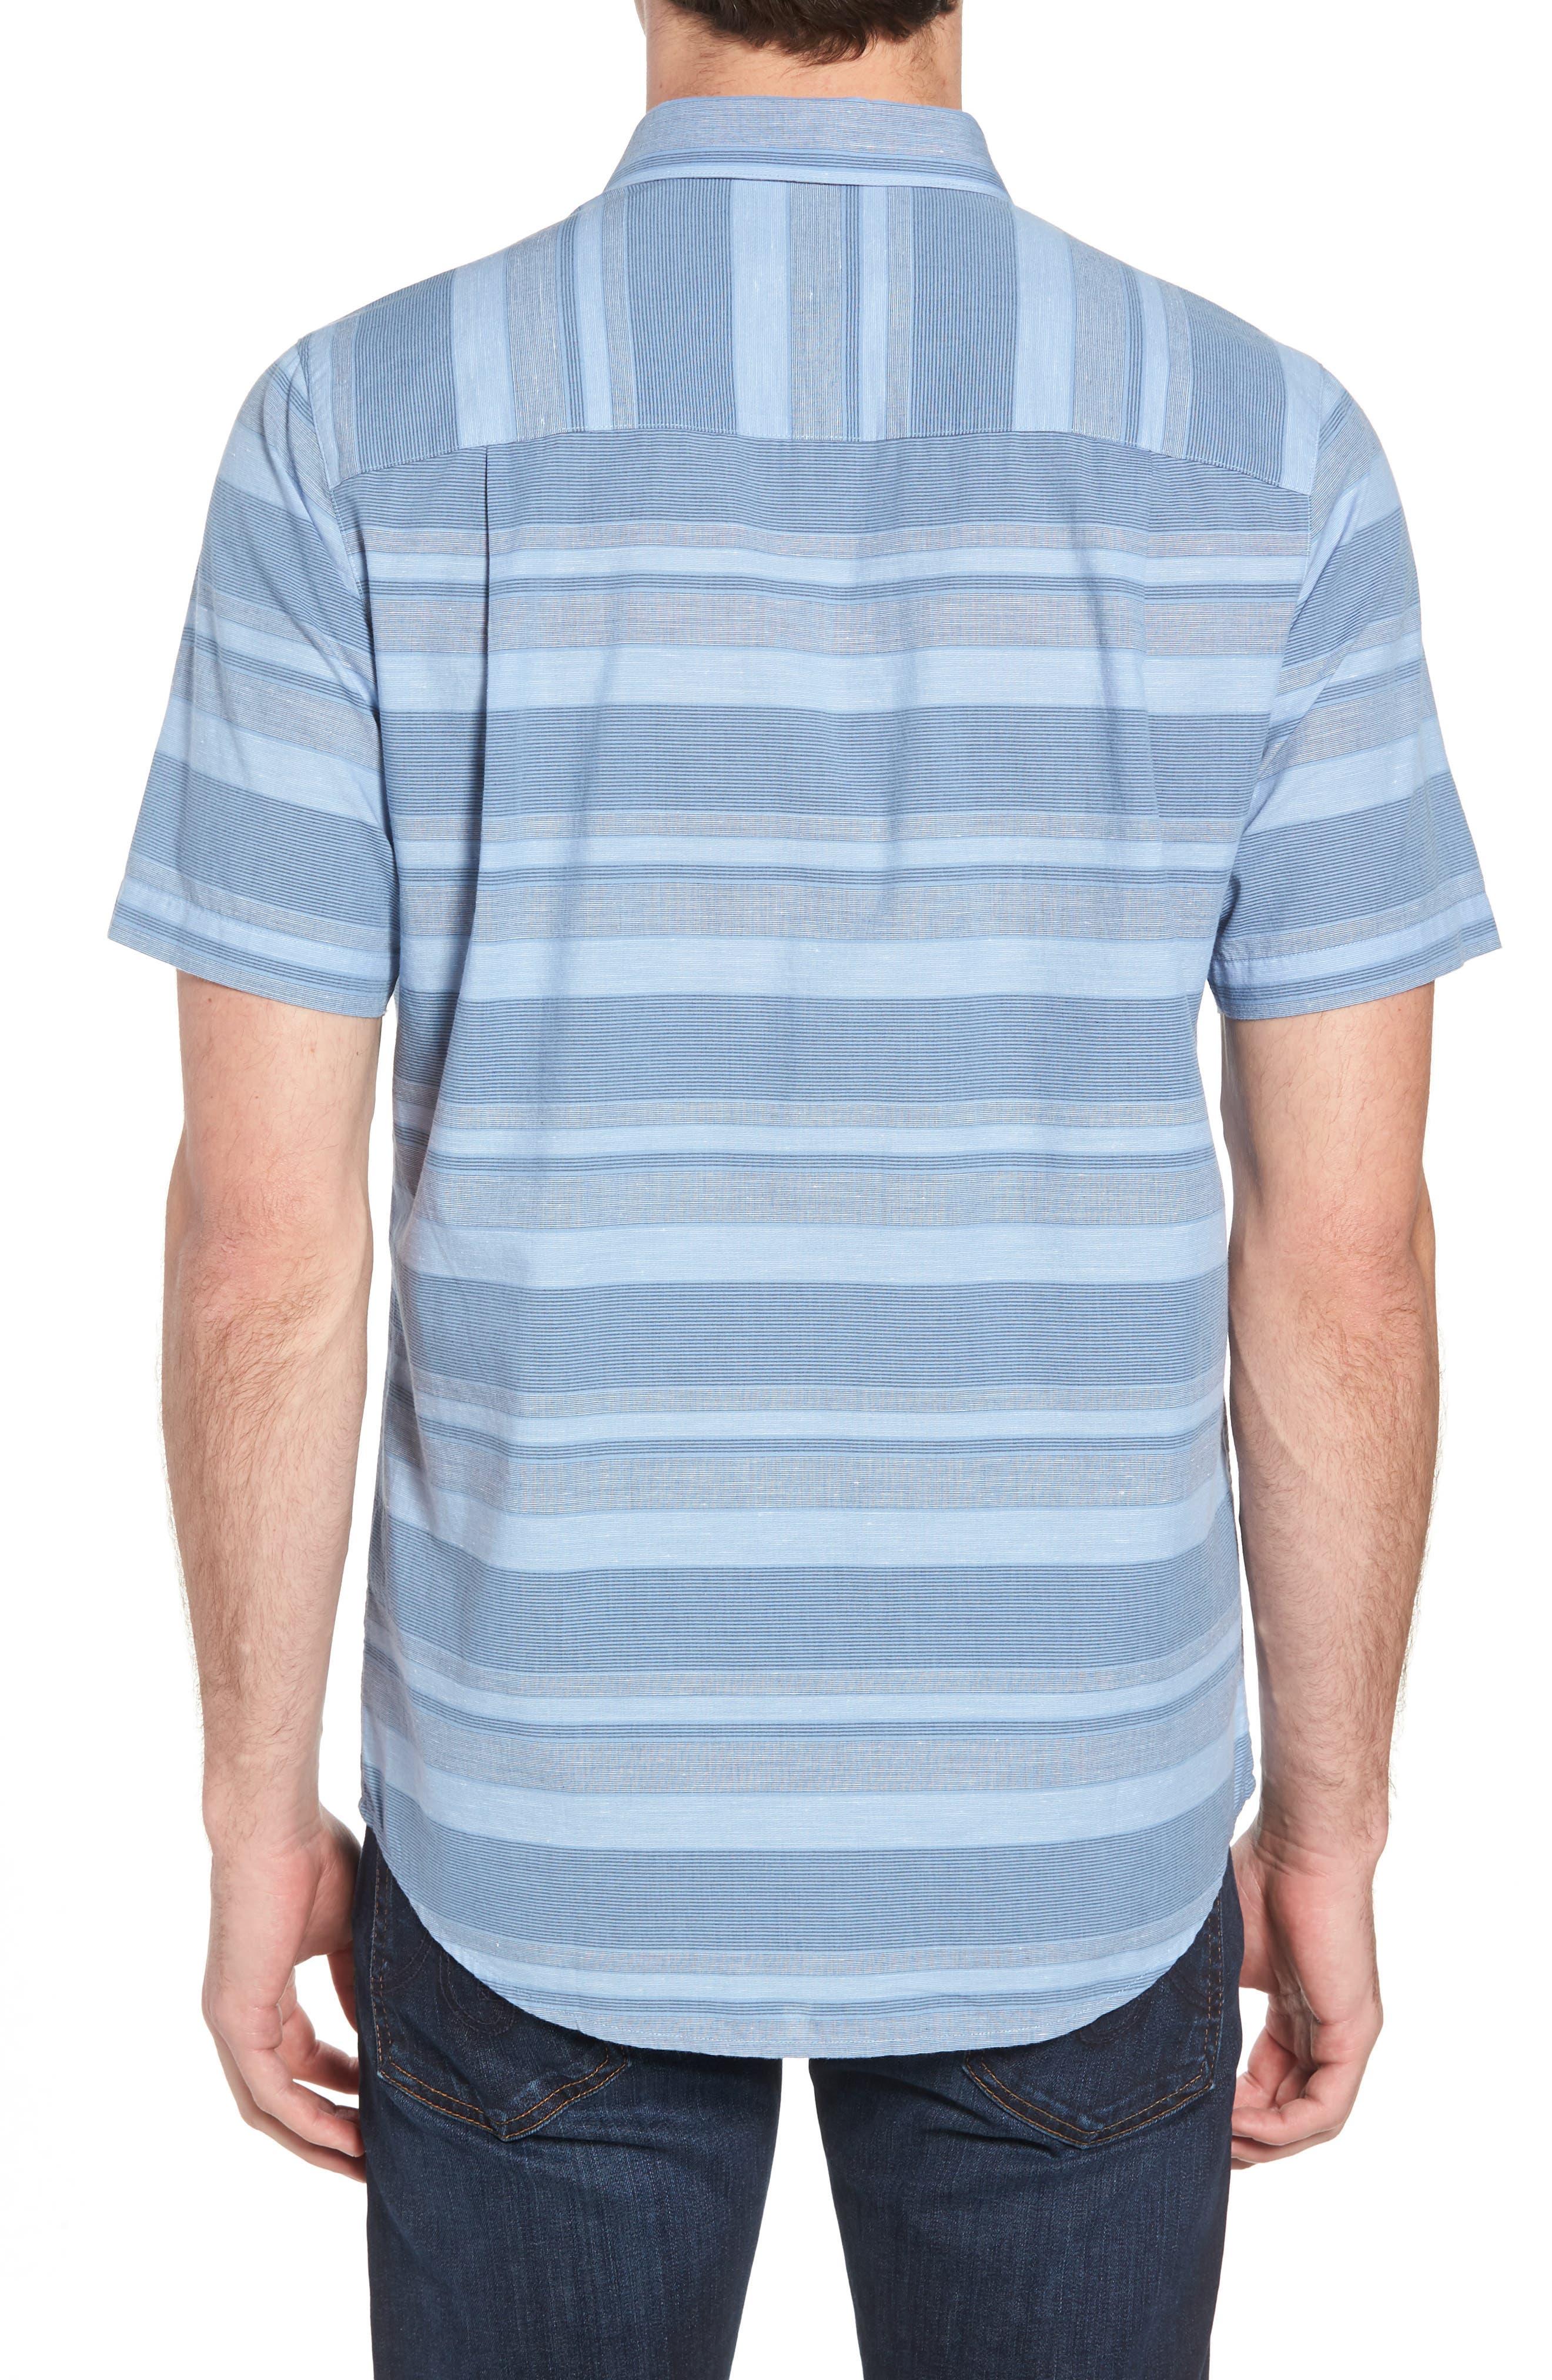 Mahe Regular Fit Sport Shirt,                             Alternate thumbnail 5, color,                             Heather Blue Nights